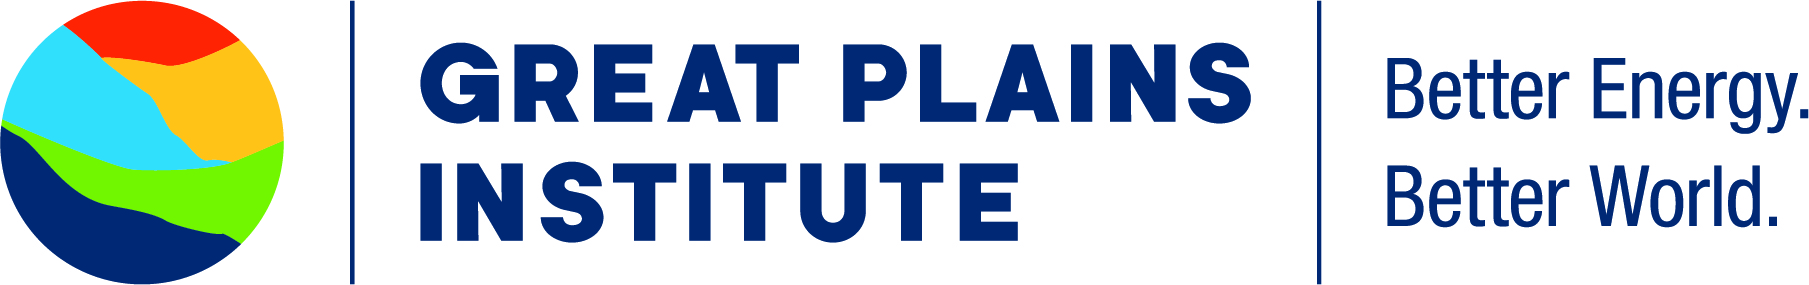 GPI logo horizontal